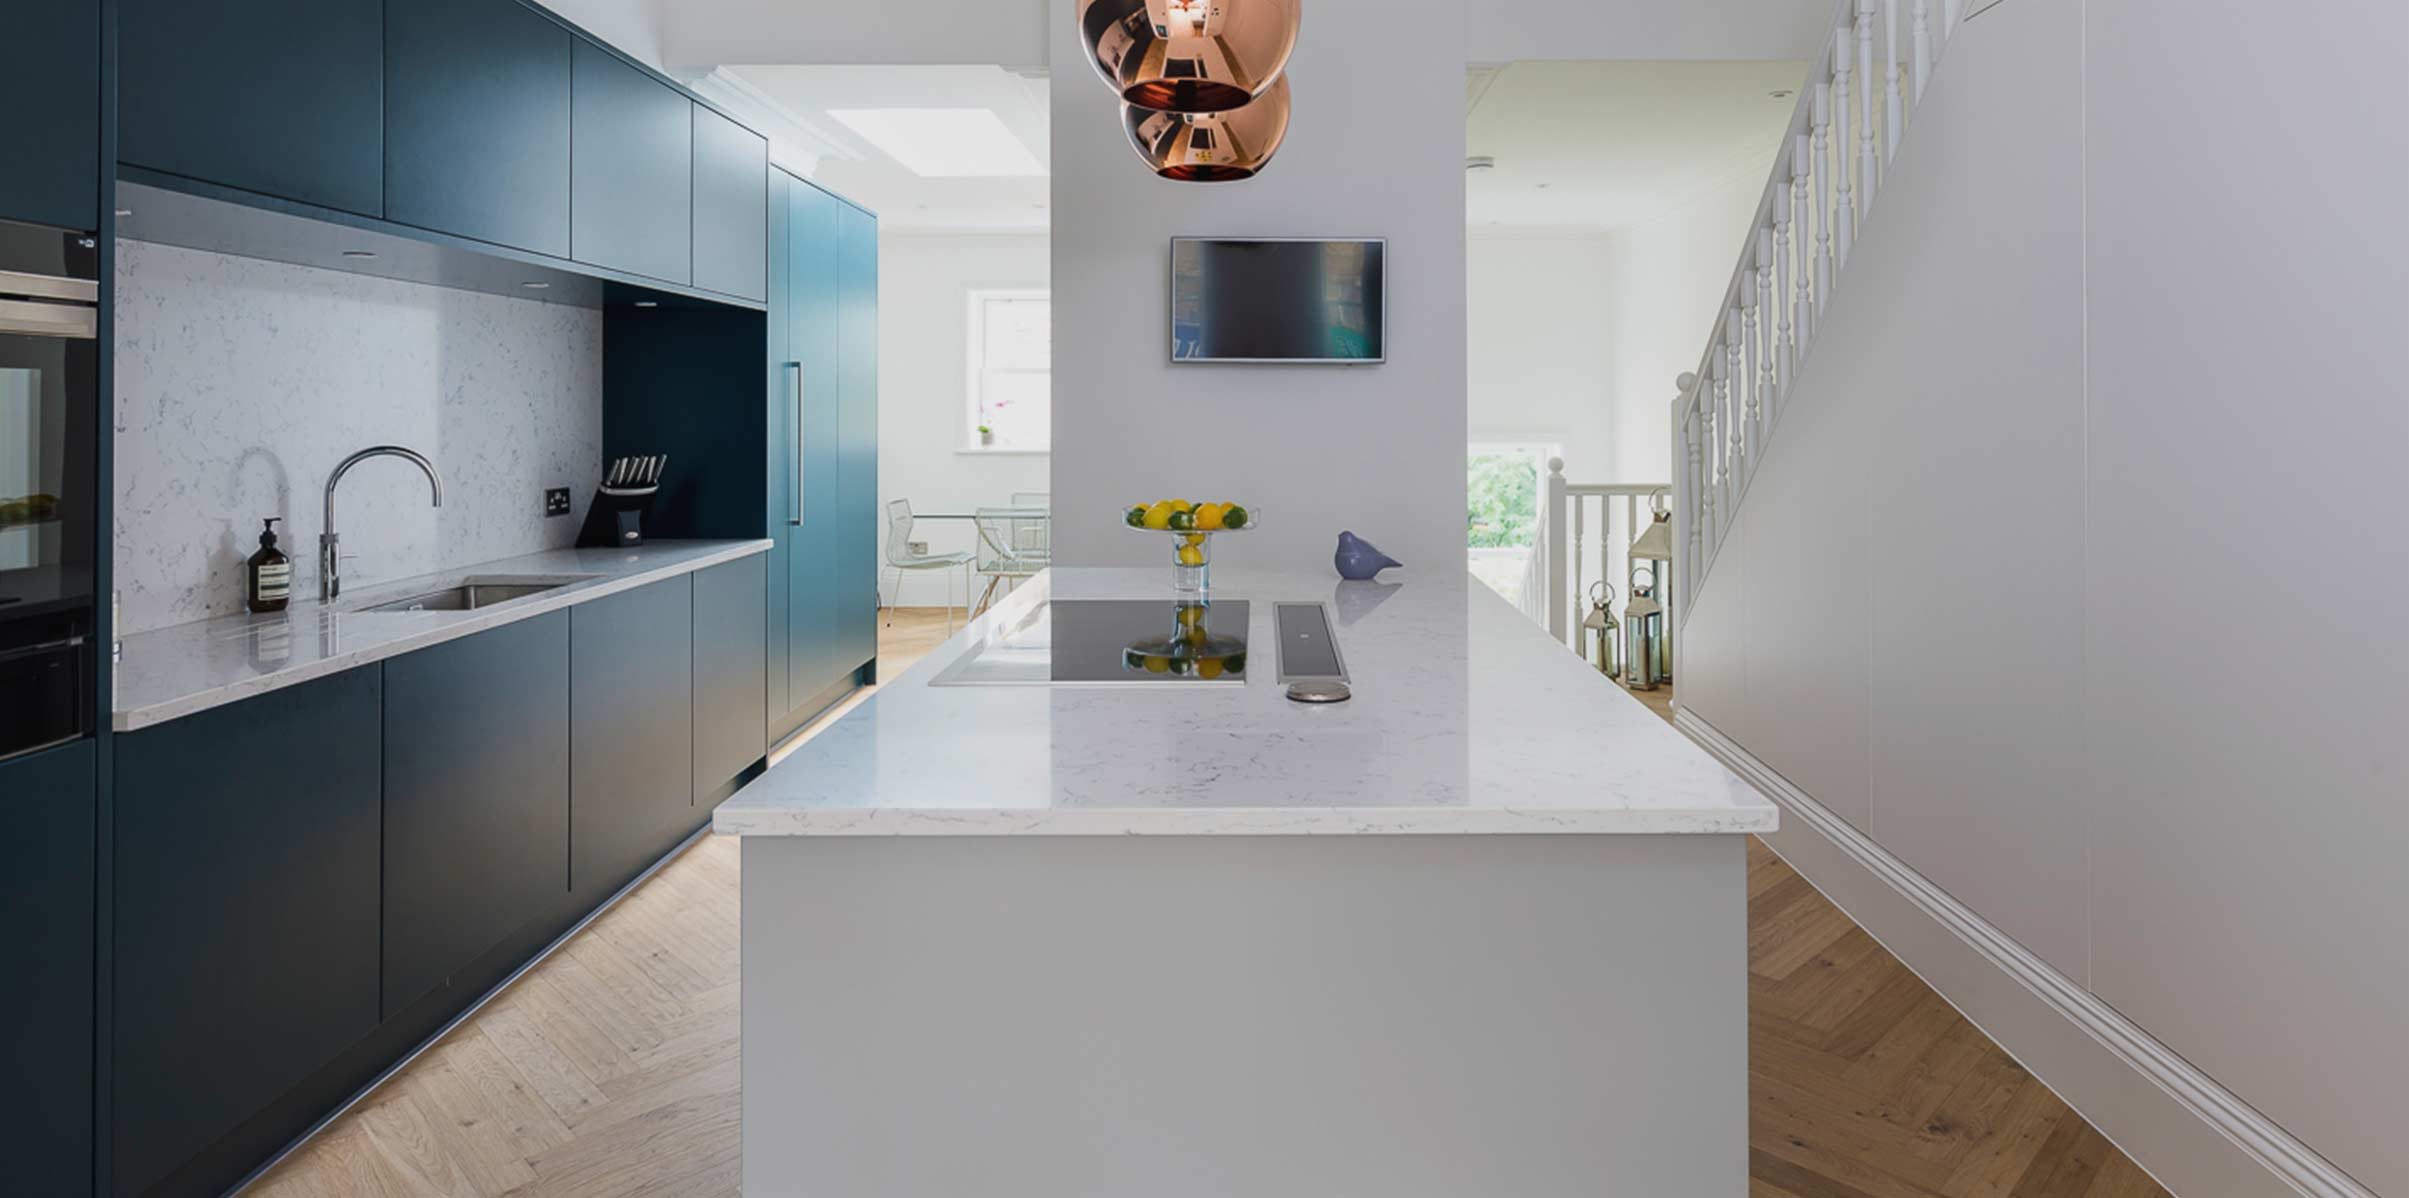 Contemporary Fusion kitchen in blue